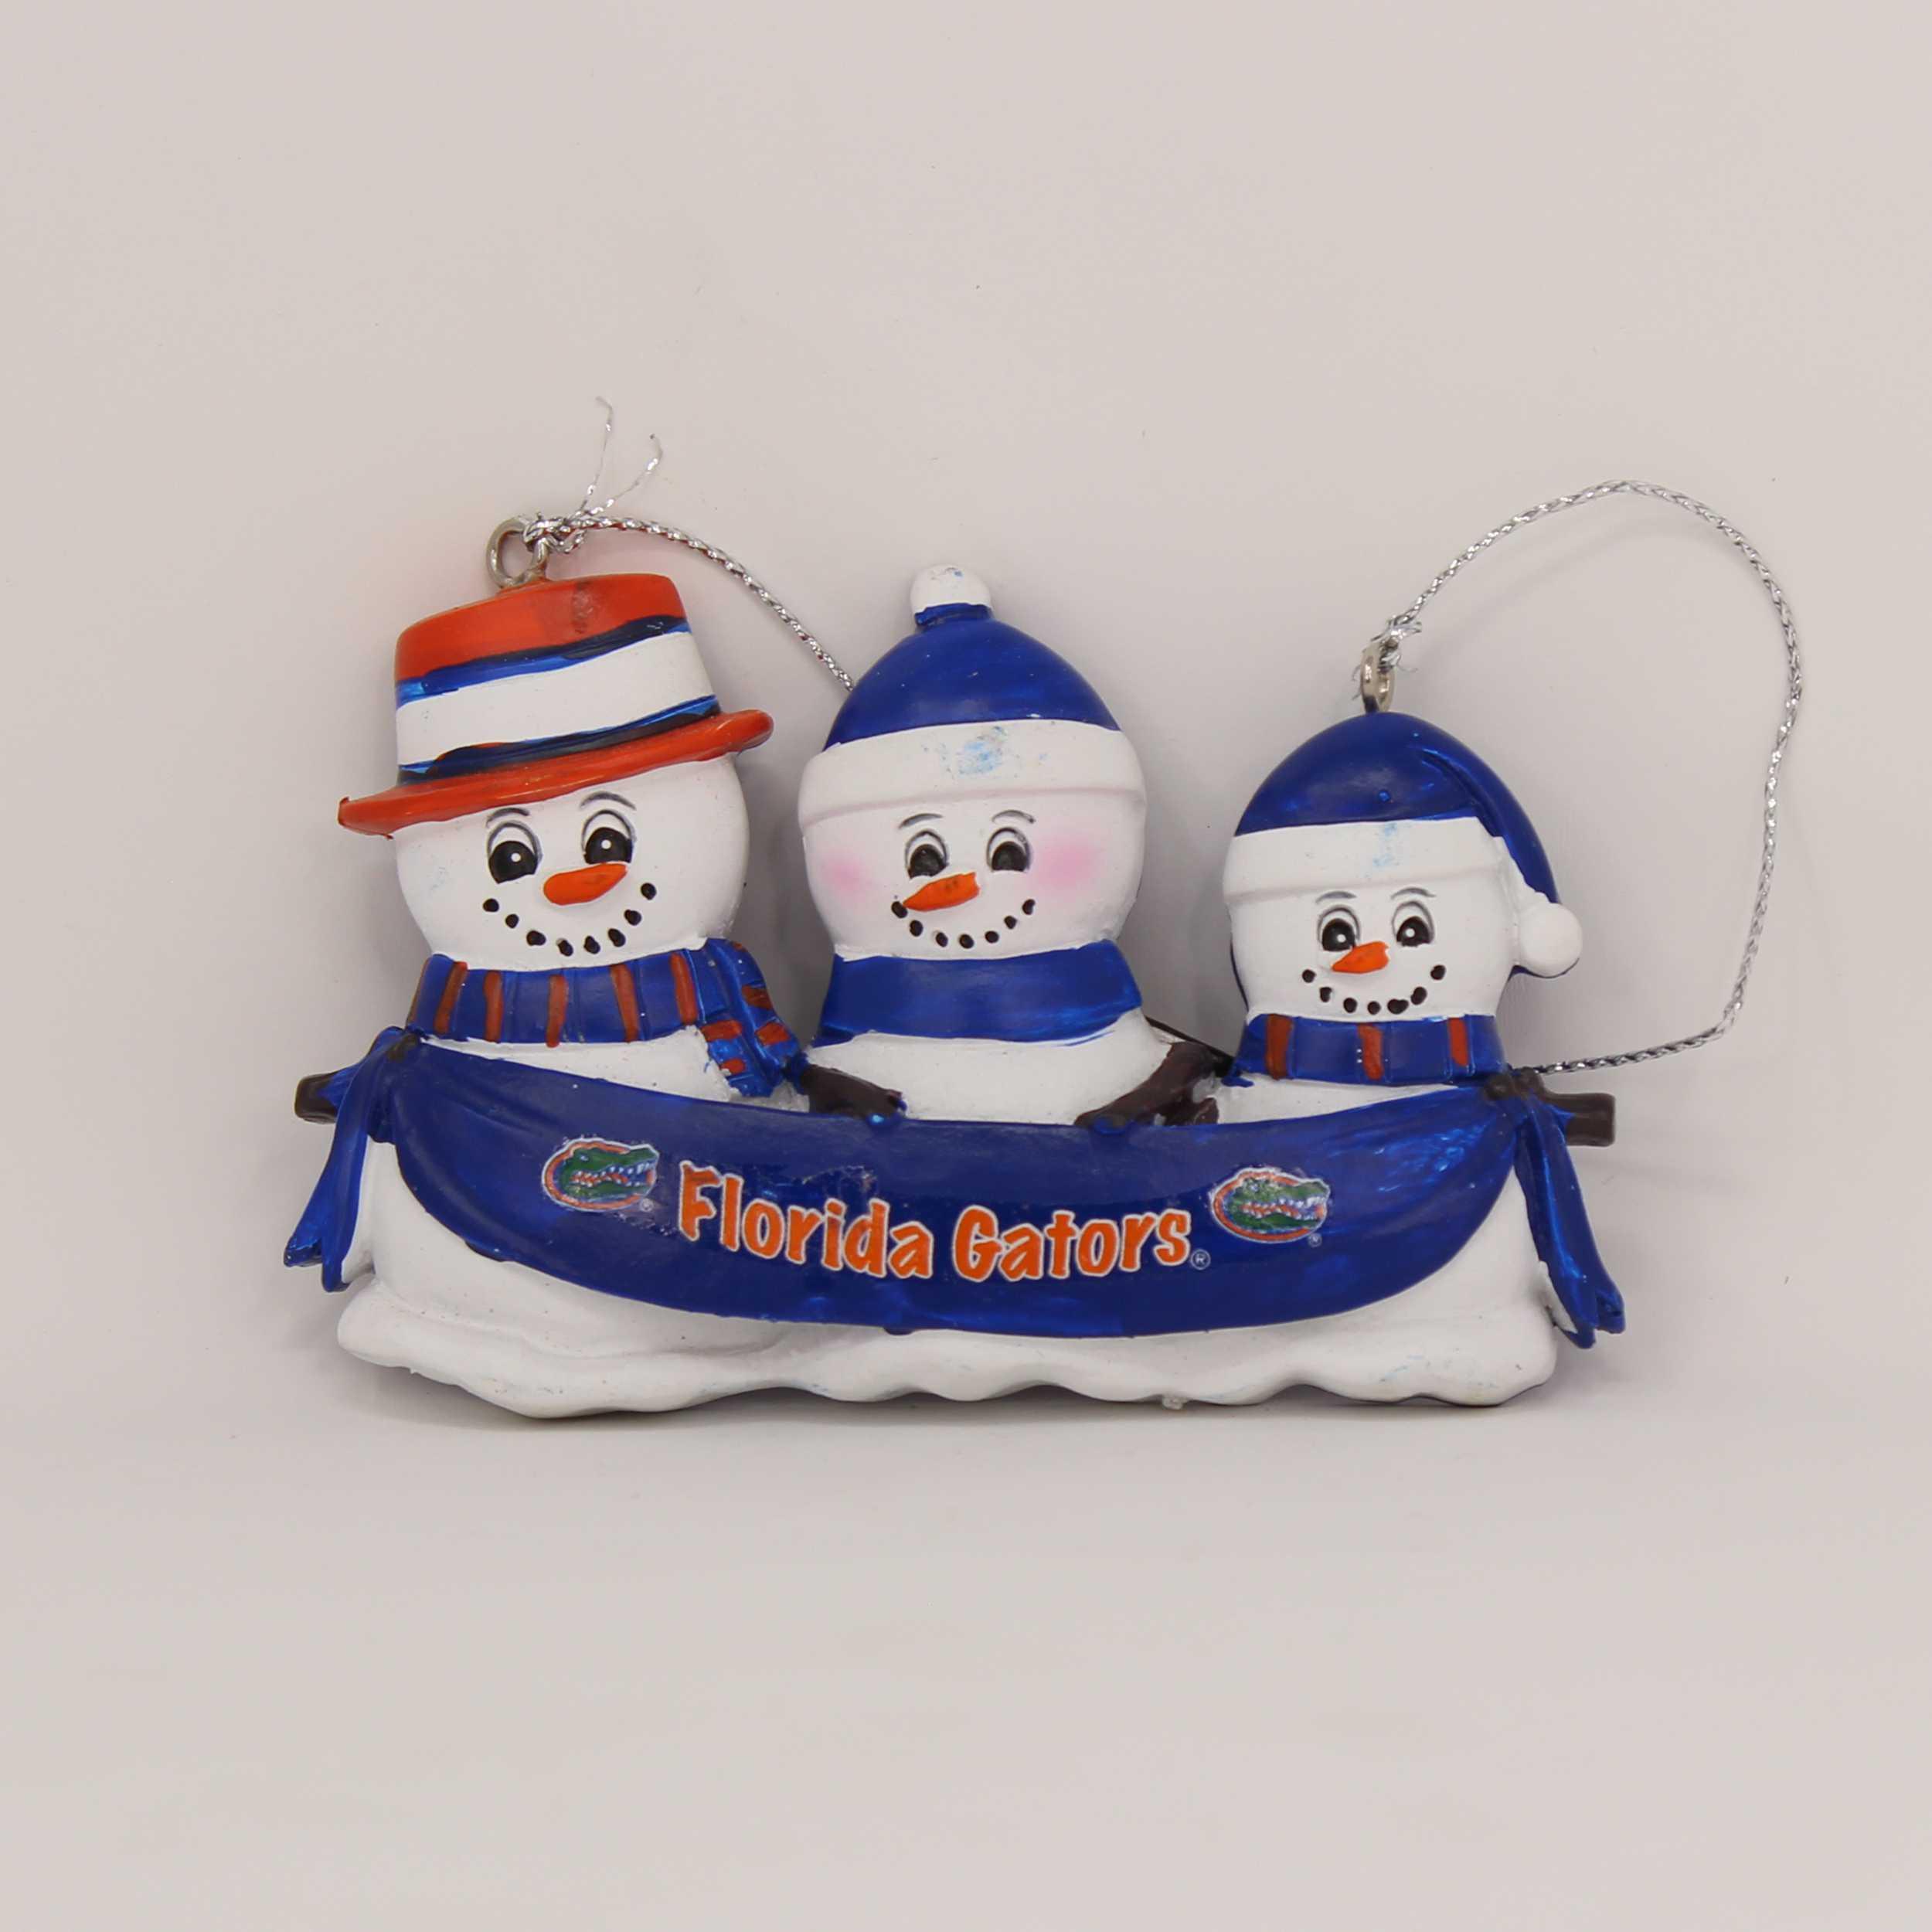 Personalized Family Ornament Florida Gators